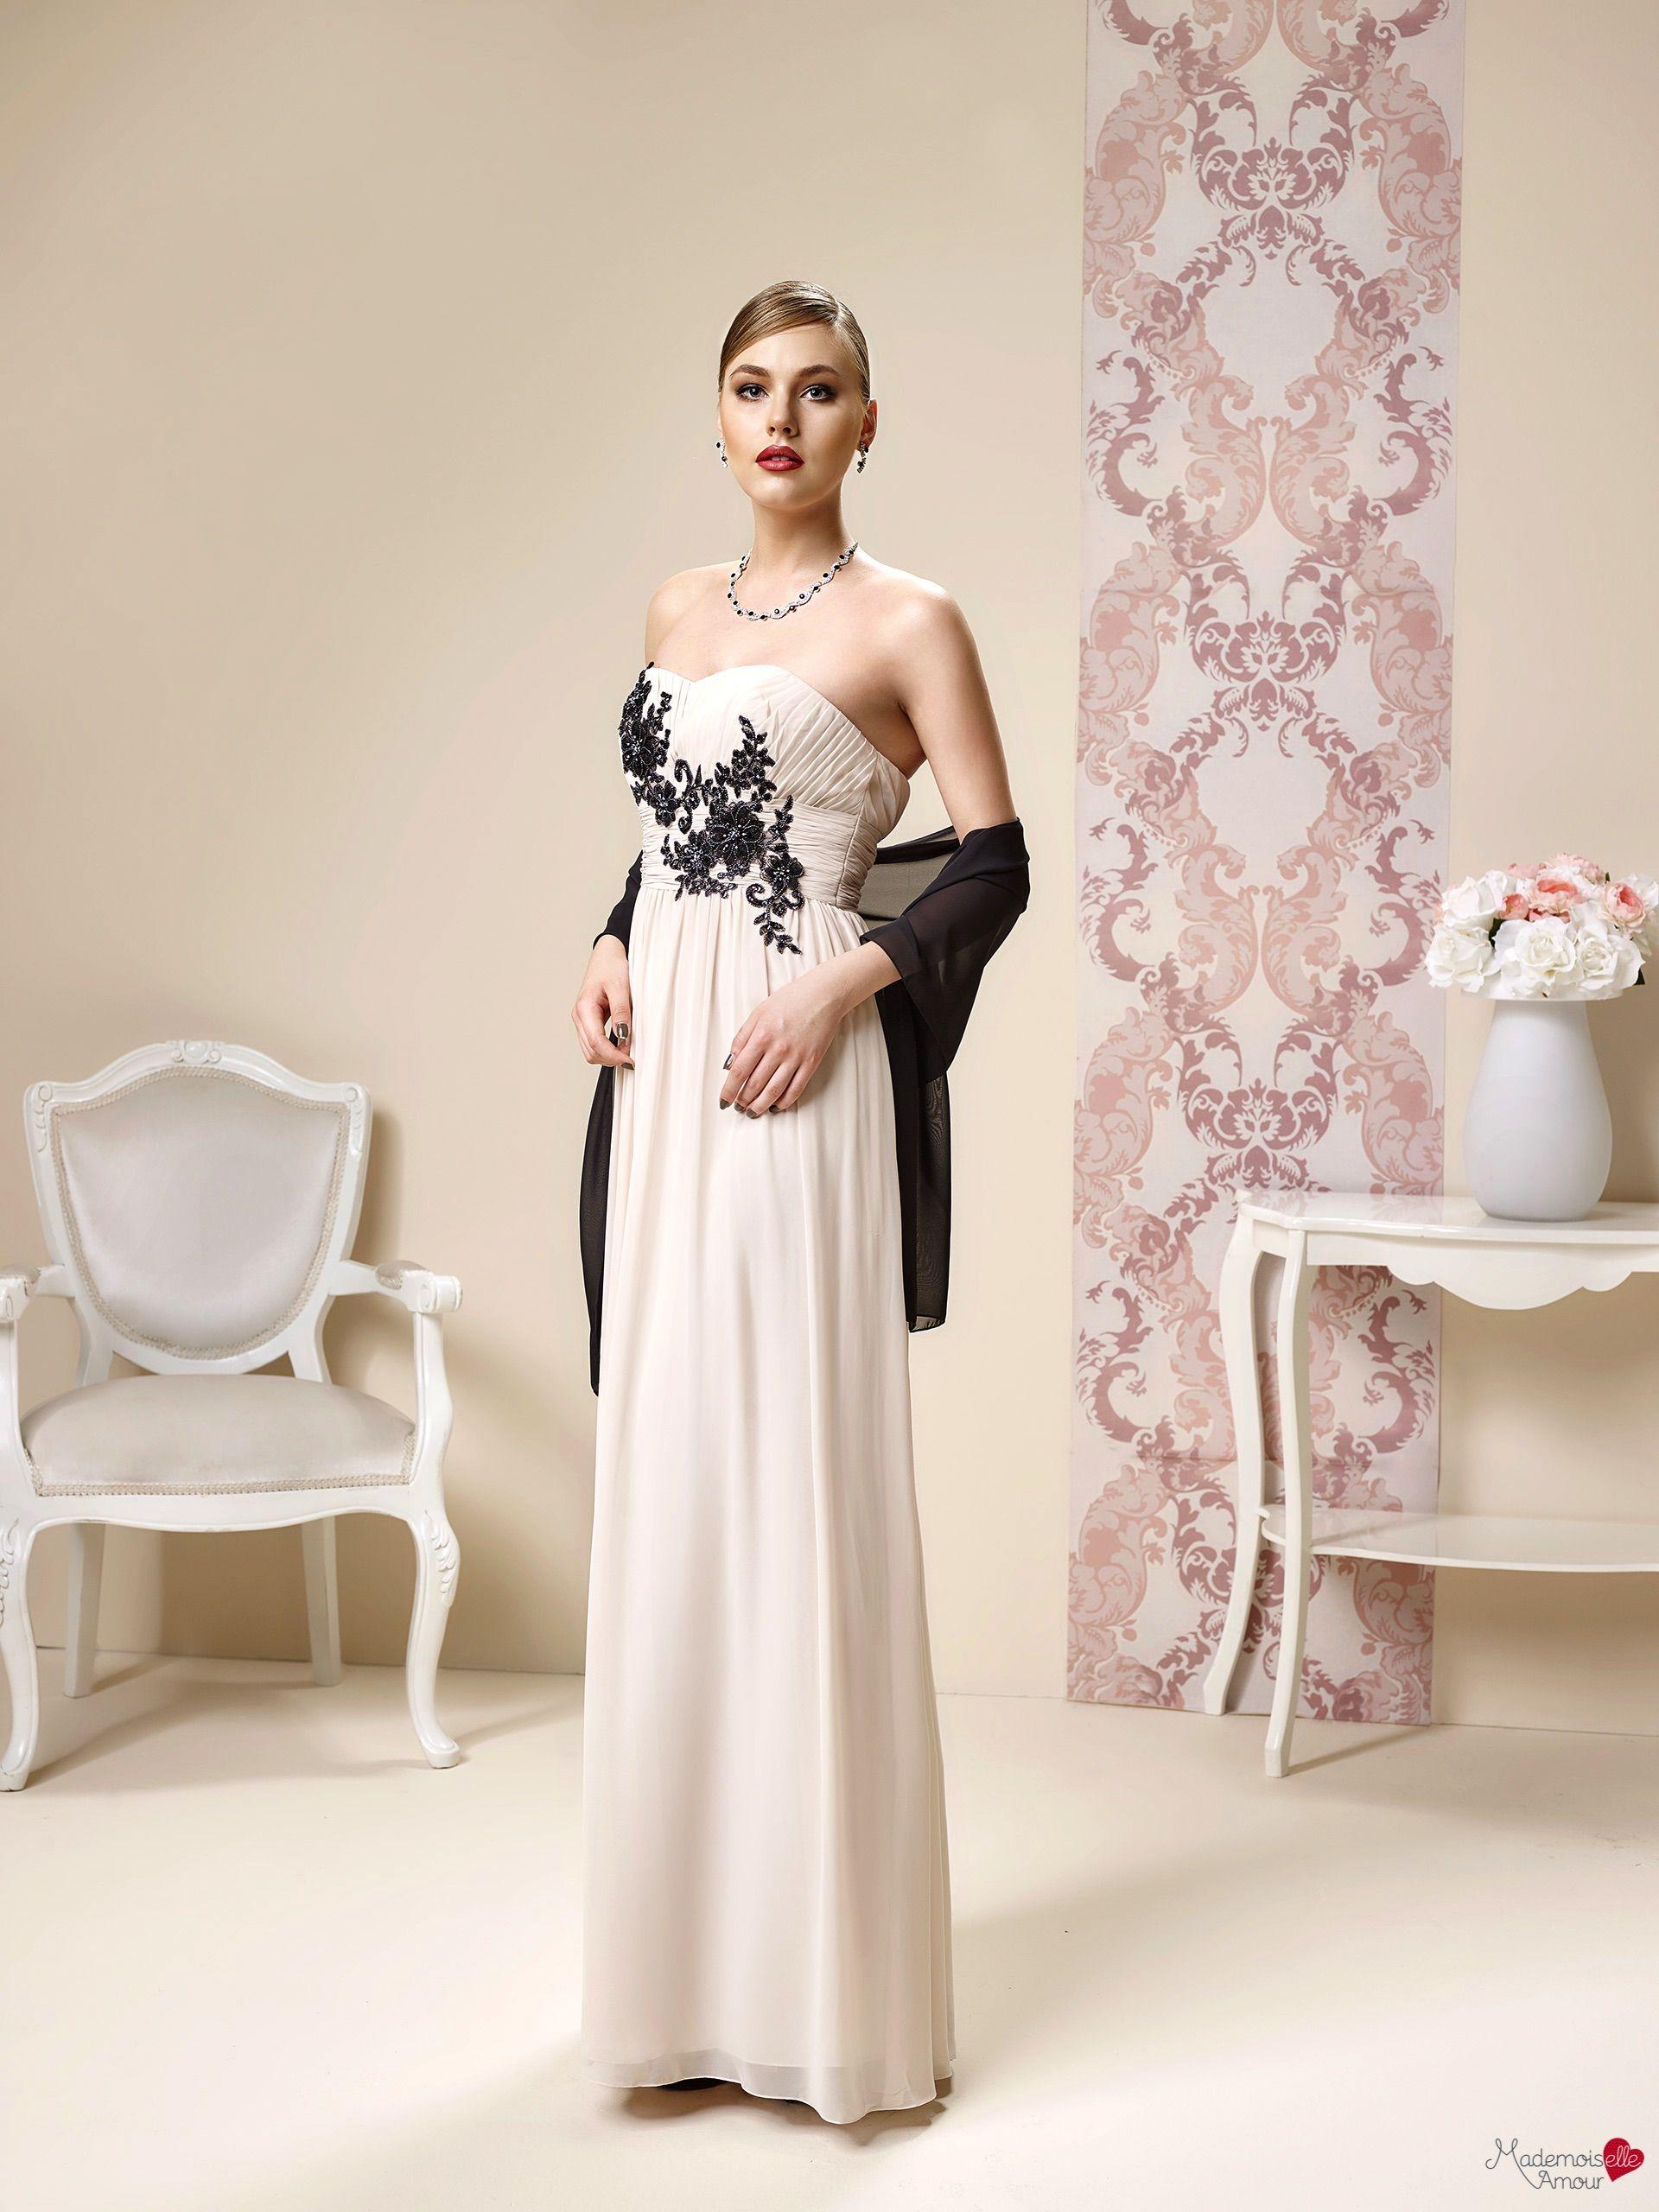 robes de cocktail mademoiselle amour mod le berlin http. Black Bedroom Furniture Sets. Home Design Ideas